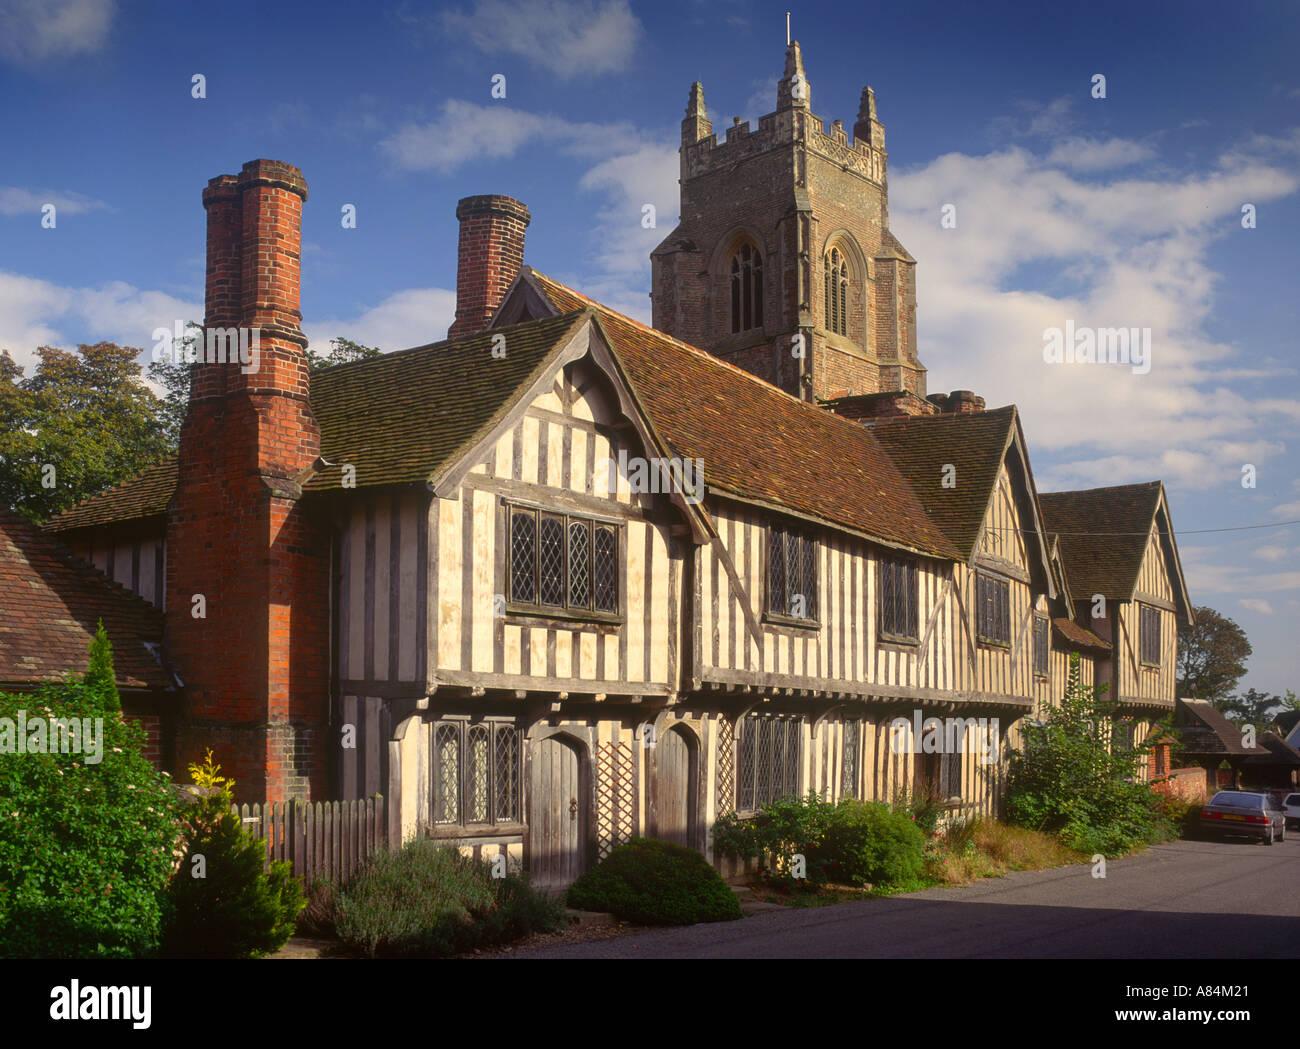 Stoke by Nayland in Suffolk England UK - Stock Image